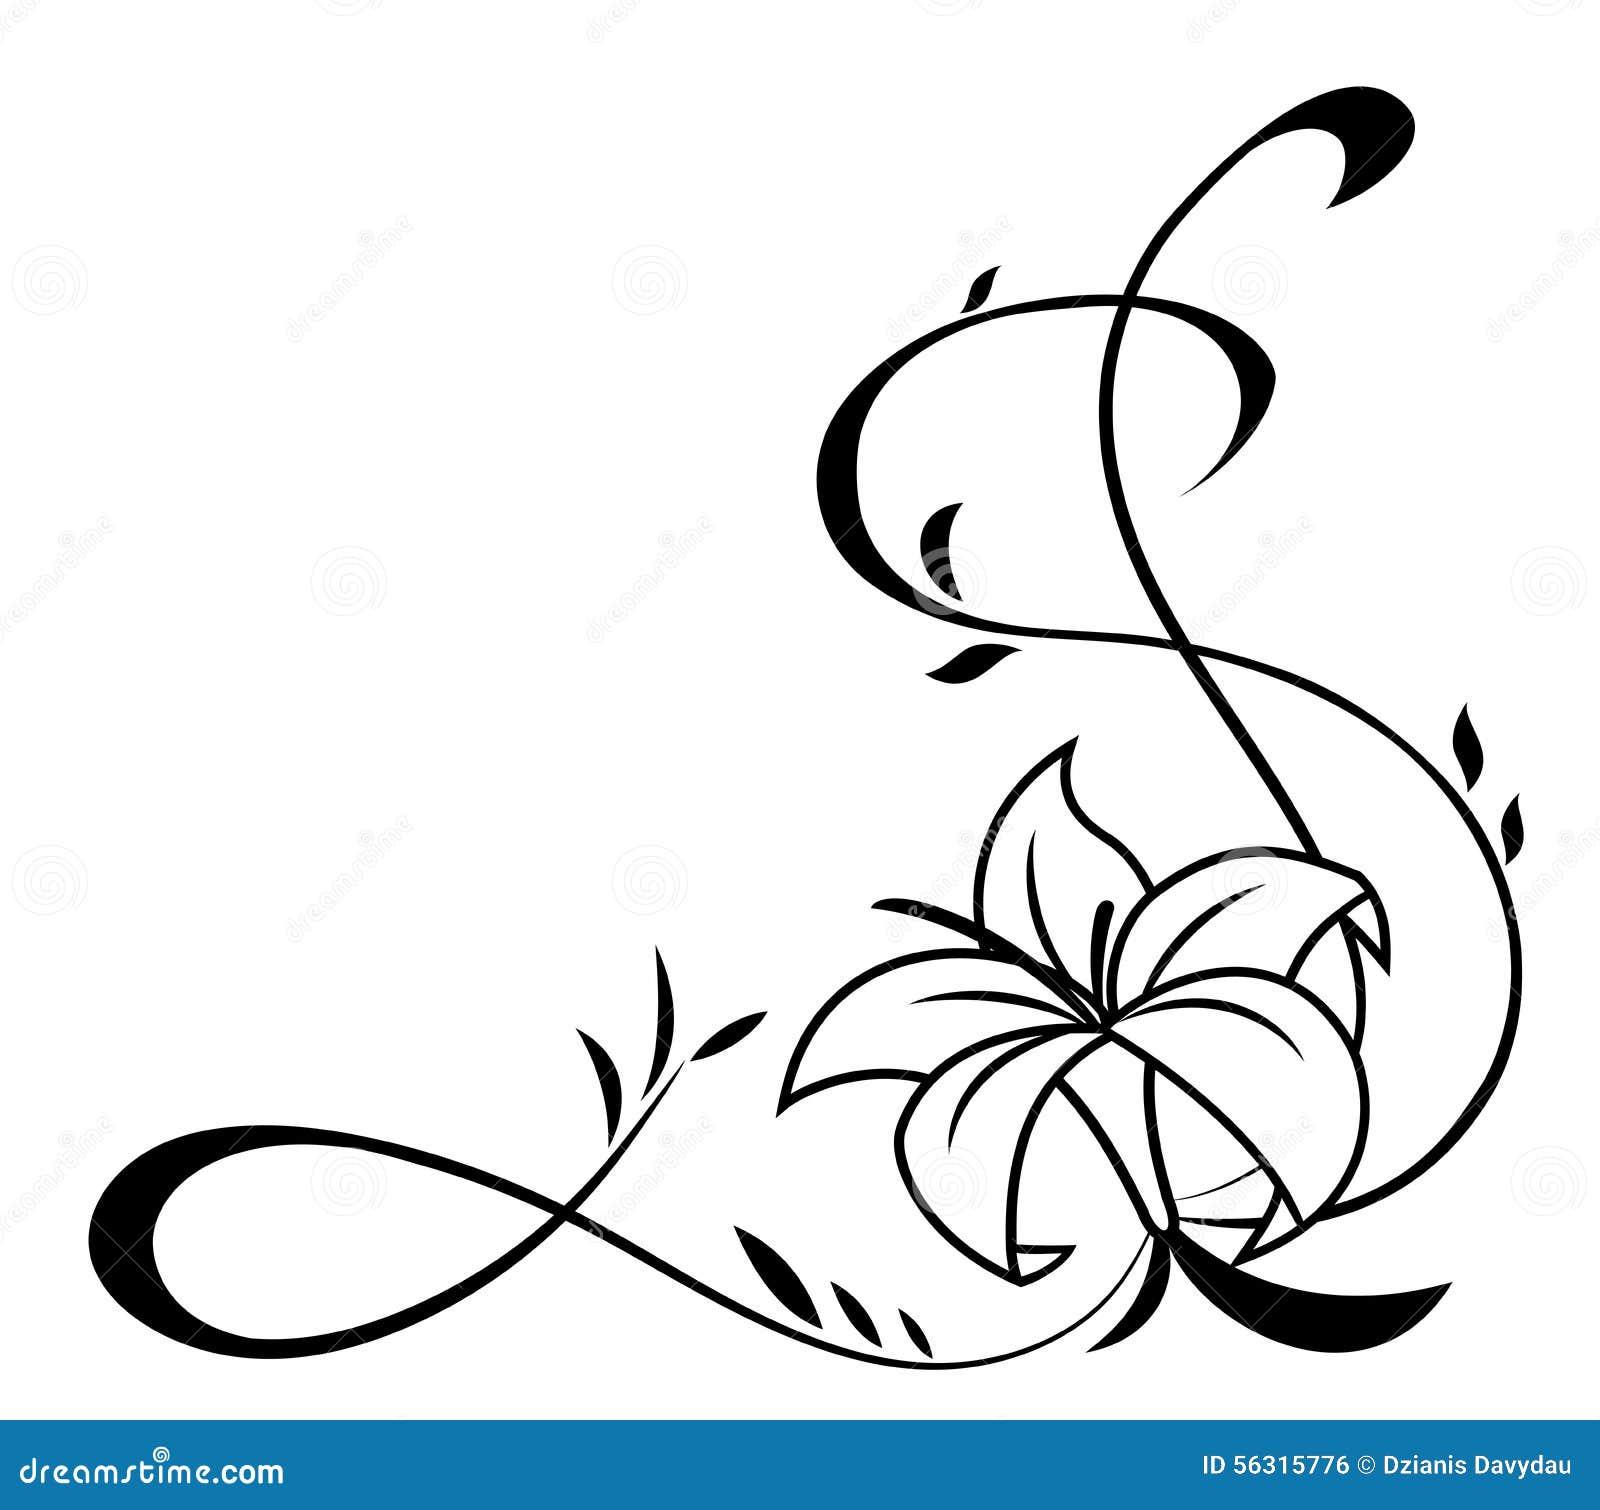 Black Flower 21st Century Op Art Set: De Lelie Bloeit Zwarte Silhouetillustratie Vector